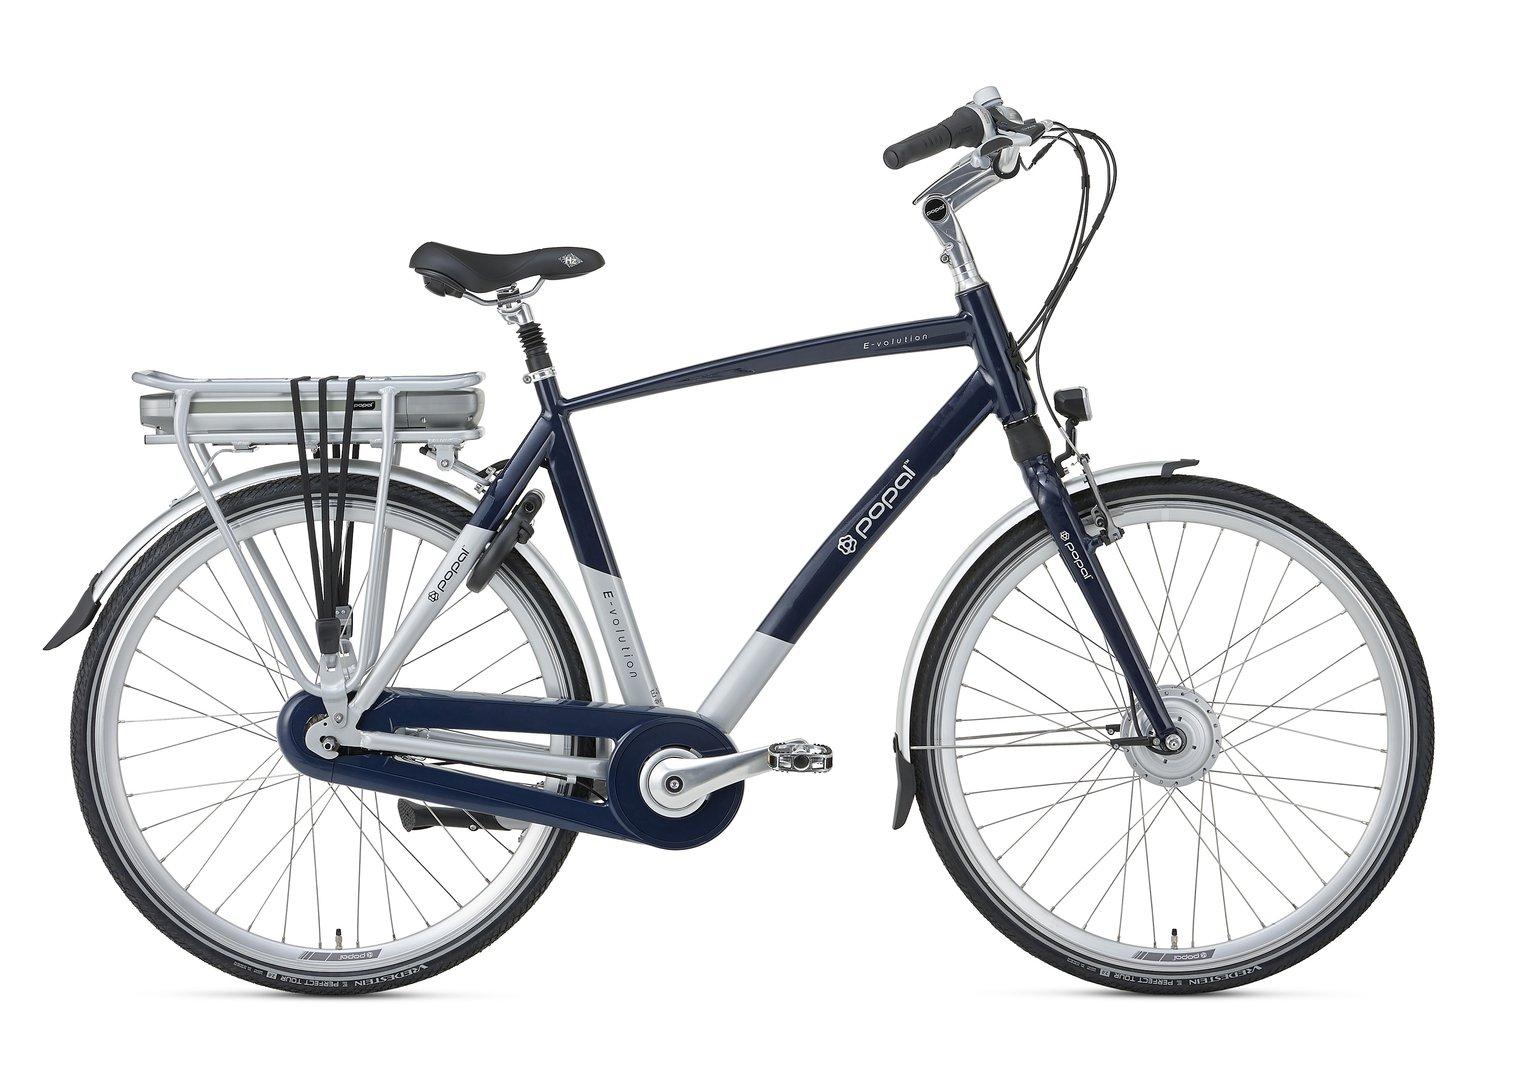 e volution 2 0 7 gang shimano nexus pedelec e bike. Black Bedroom Furniture Sets. Home Design Ideas